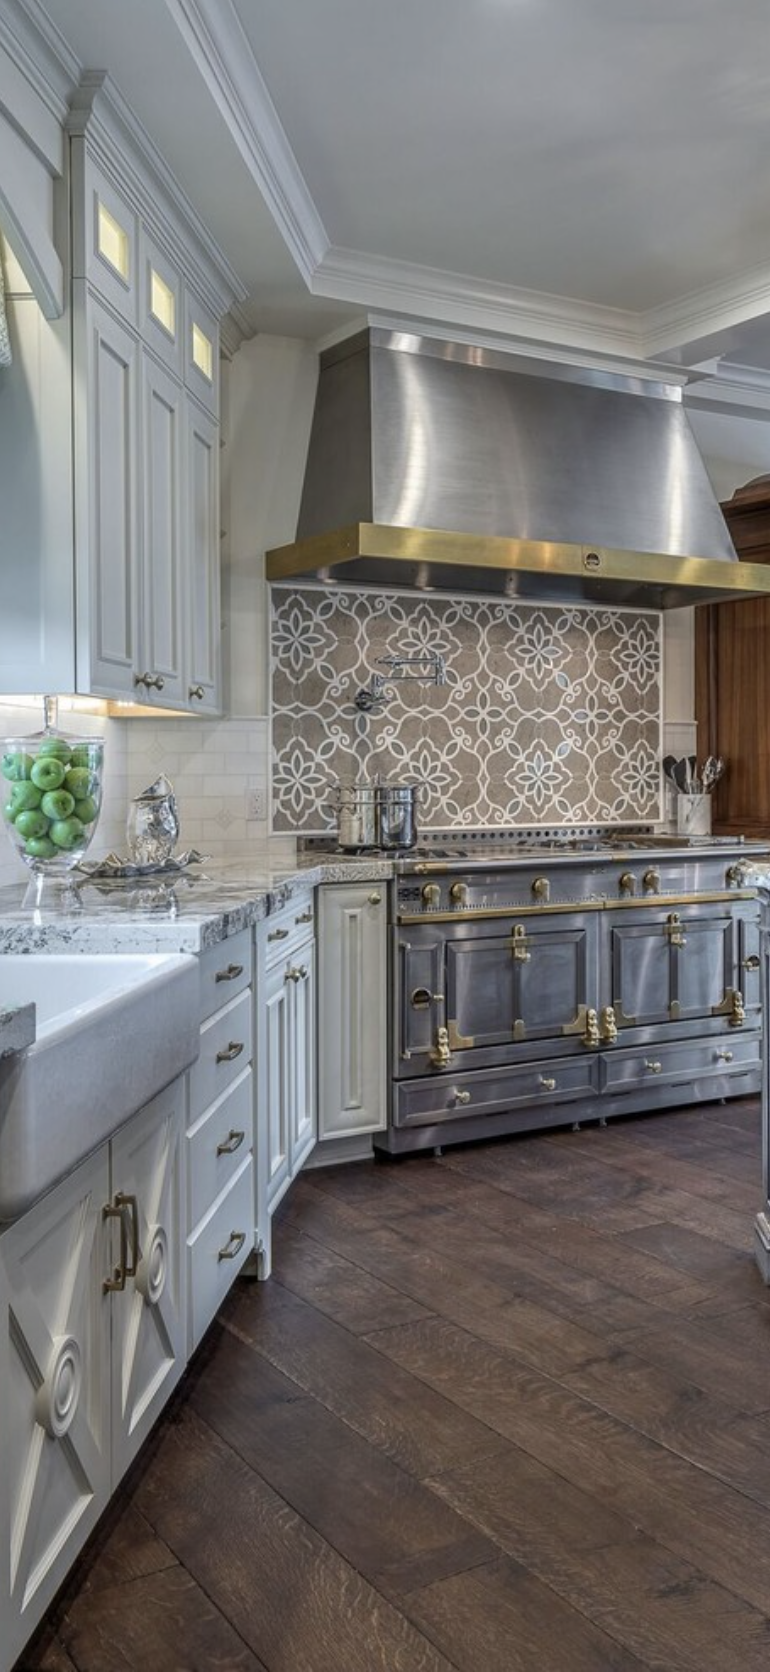 20+ Modern Italian Kitchen Design Ideas | Cocinas, Interiores y ...